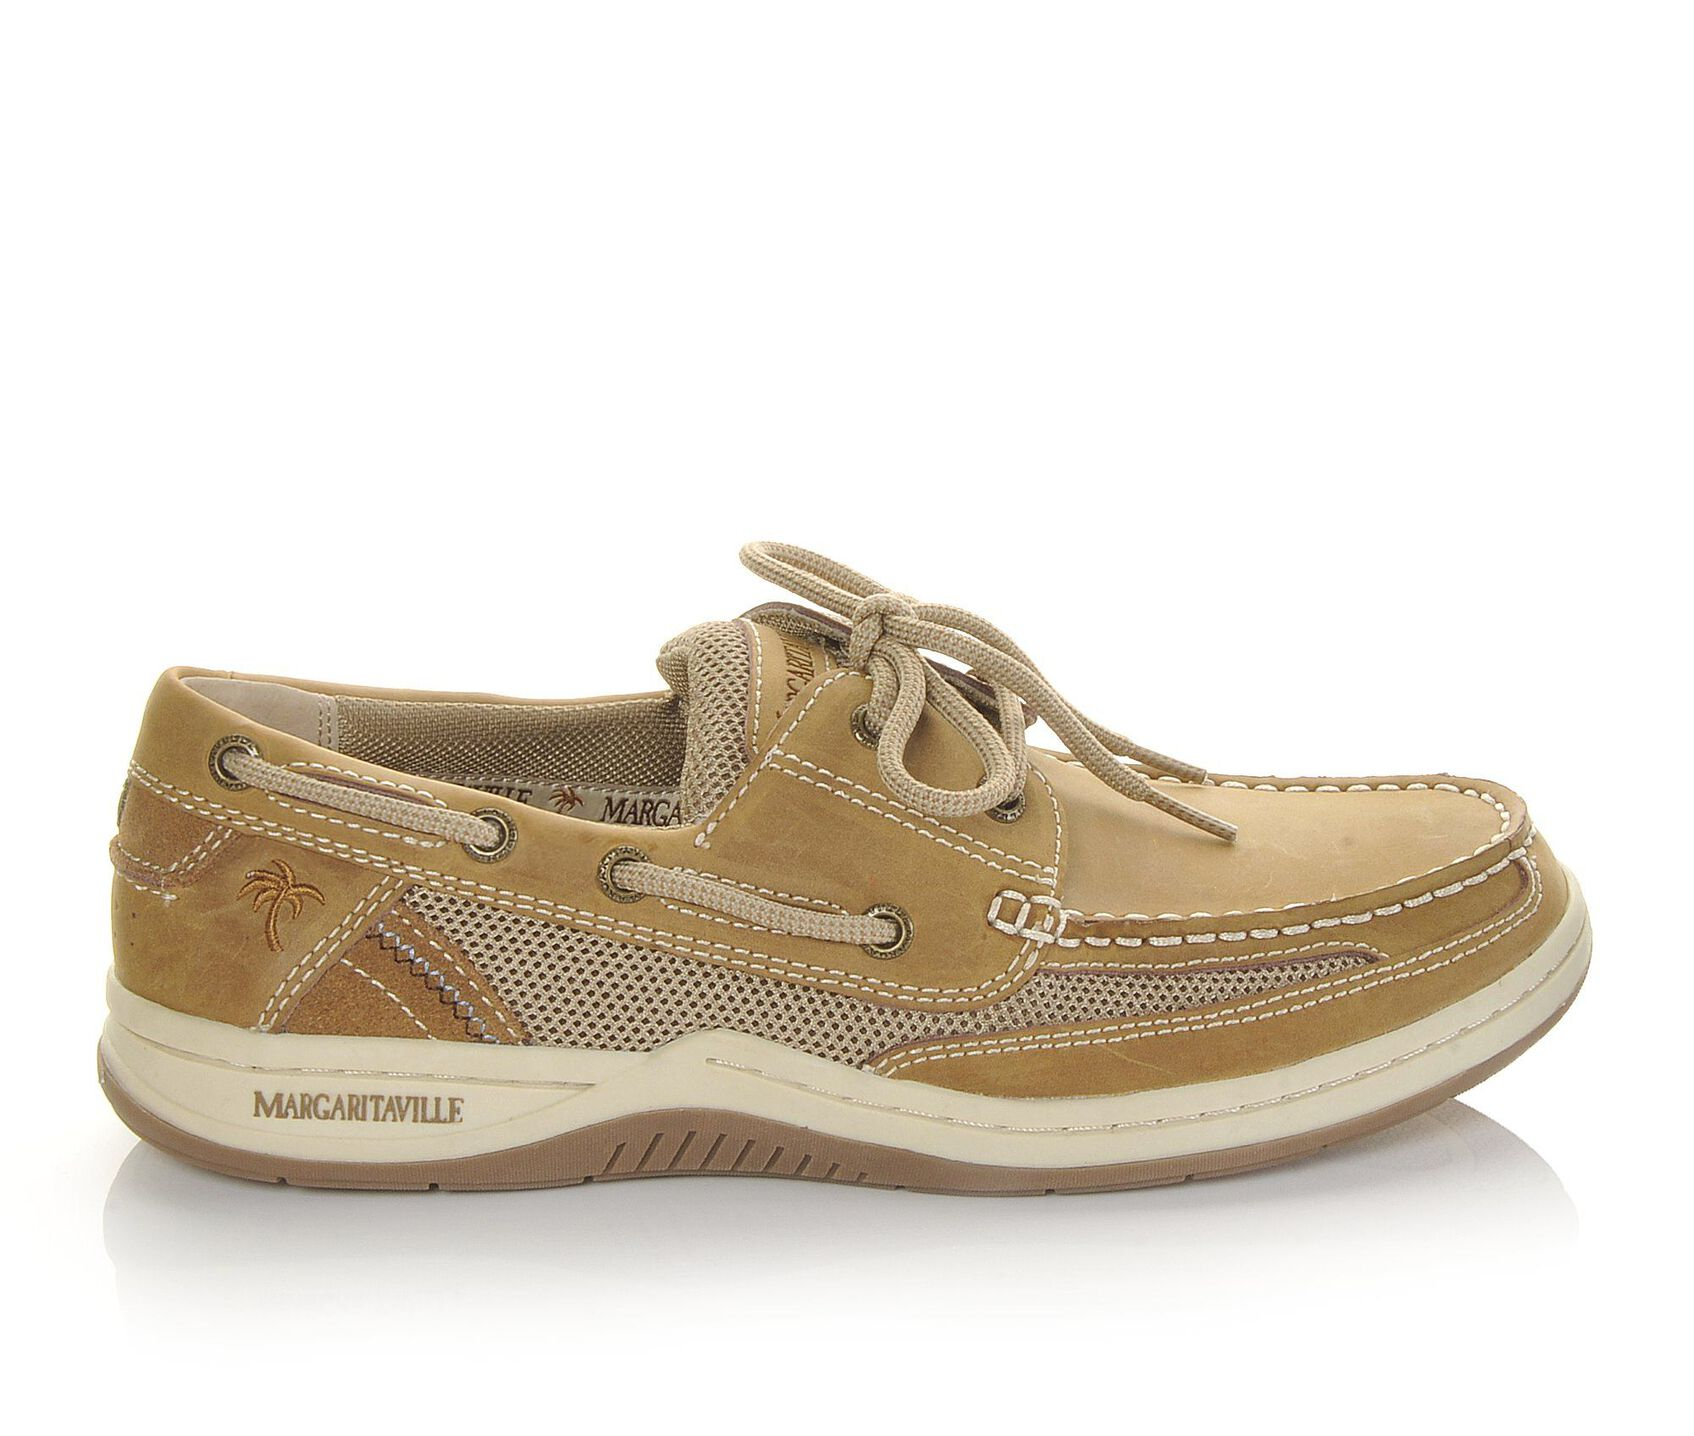 225f98872065 Men's Margaritaville Anchor 2 Eye Boat Shoes